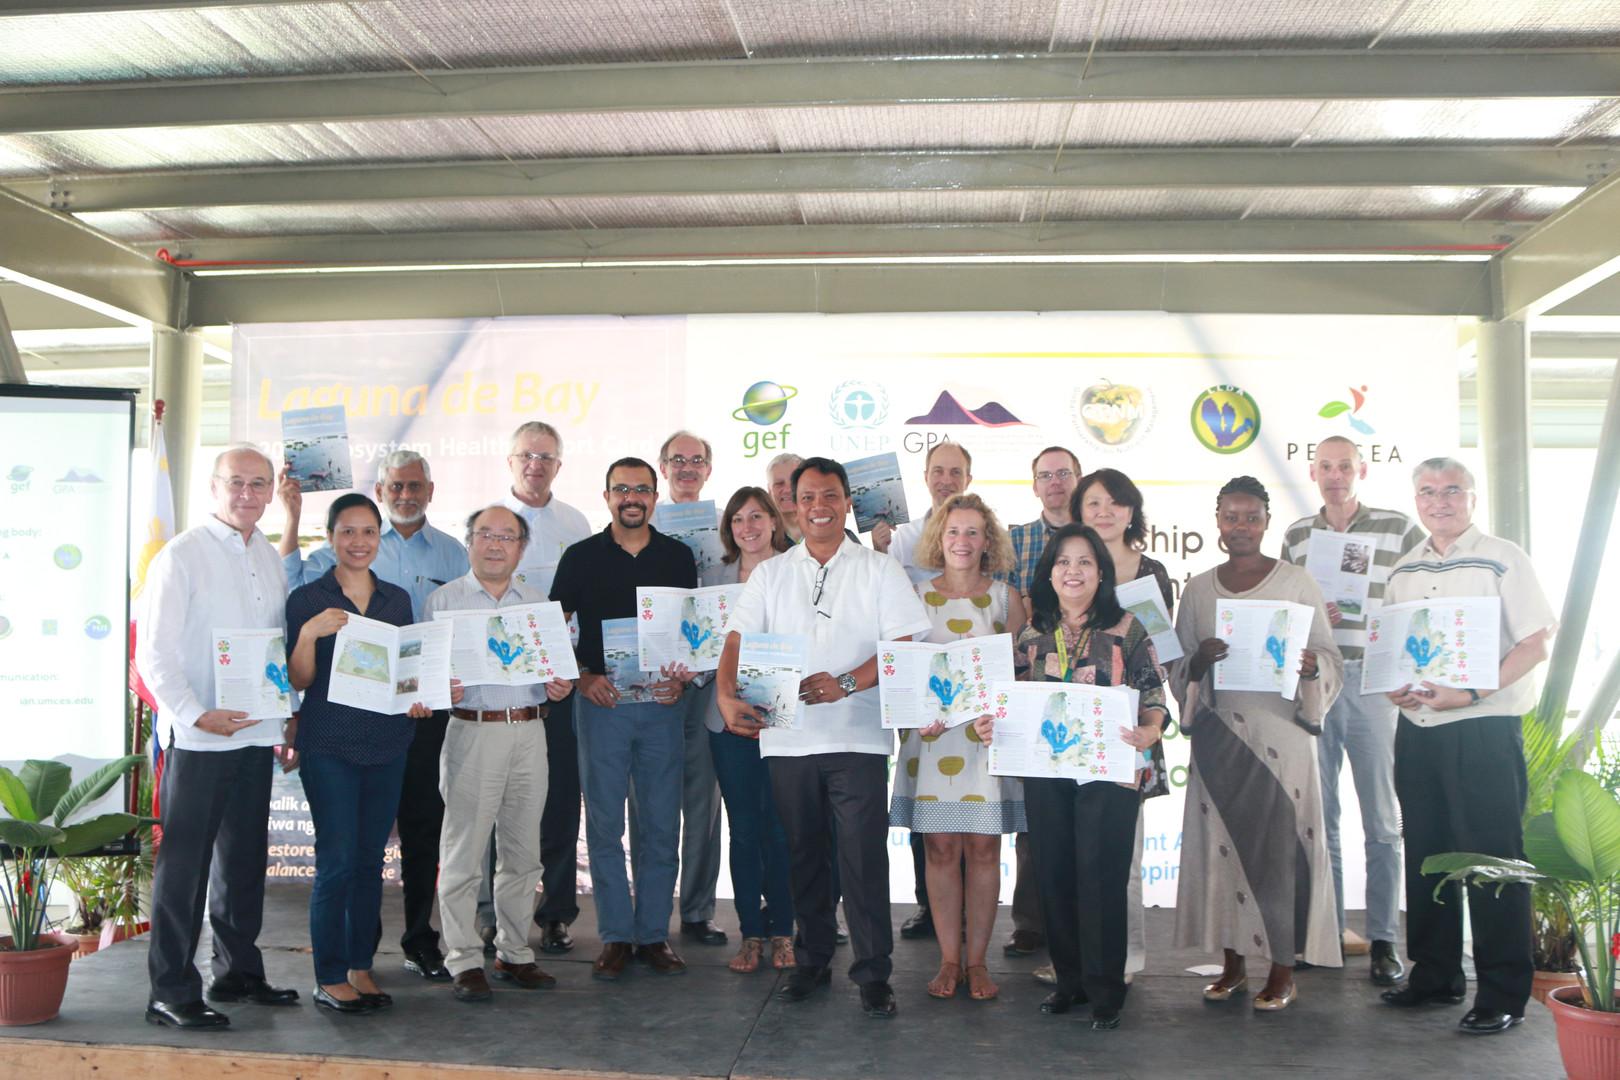 launch-event-for-the-laguna-de-bay-ecosy